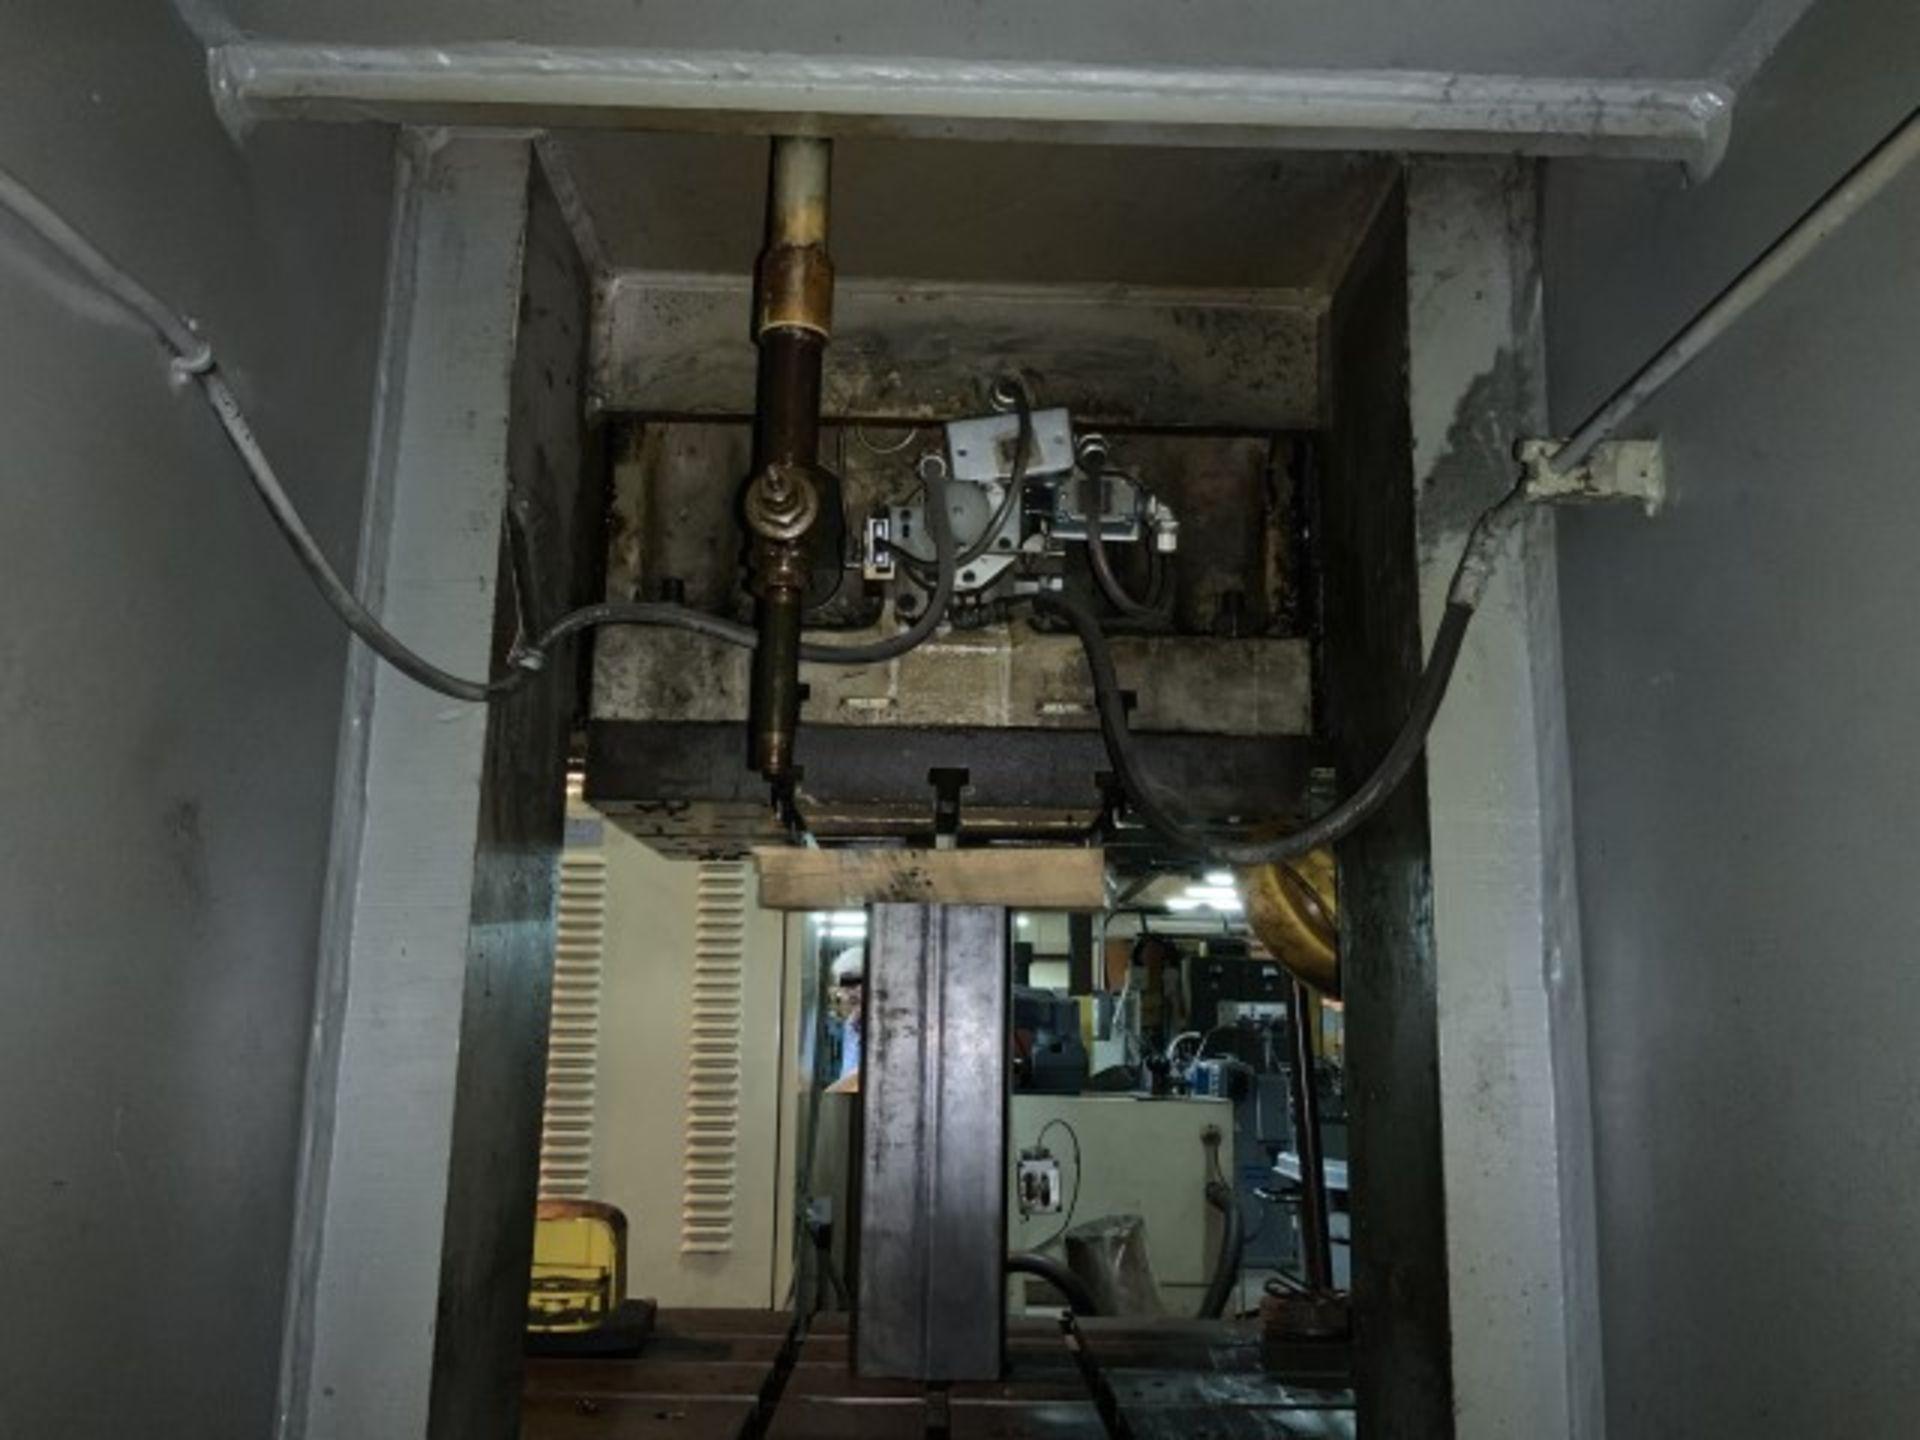 Gap press - Image 6 of 11